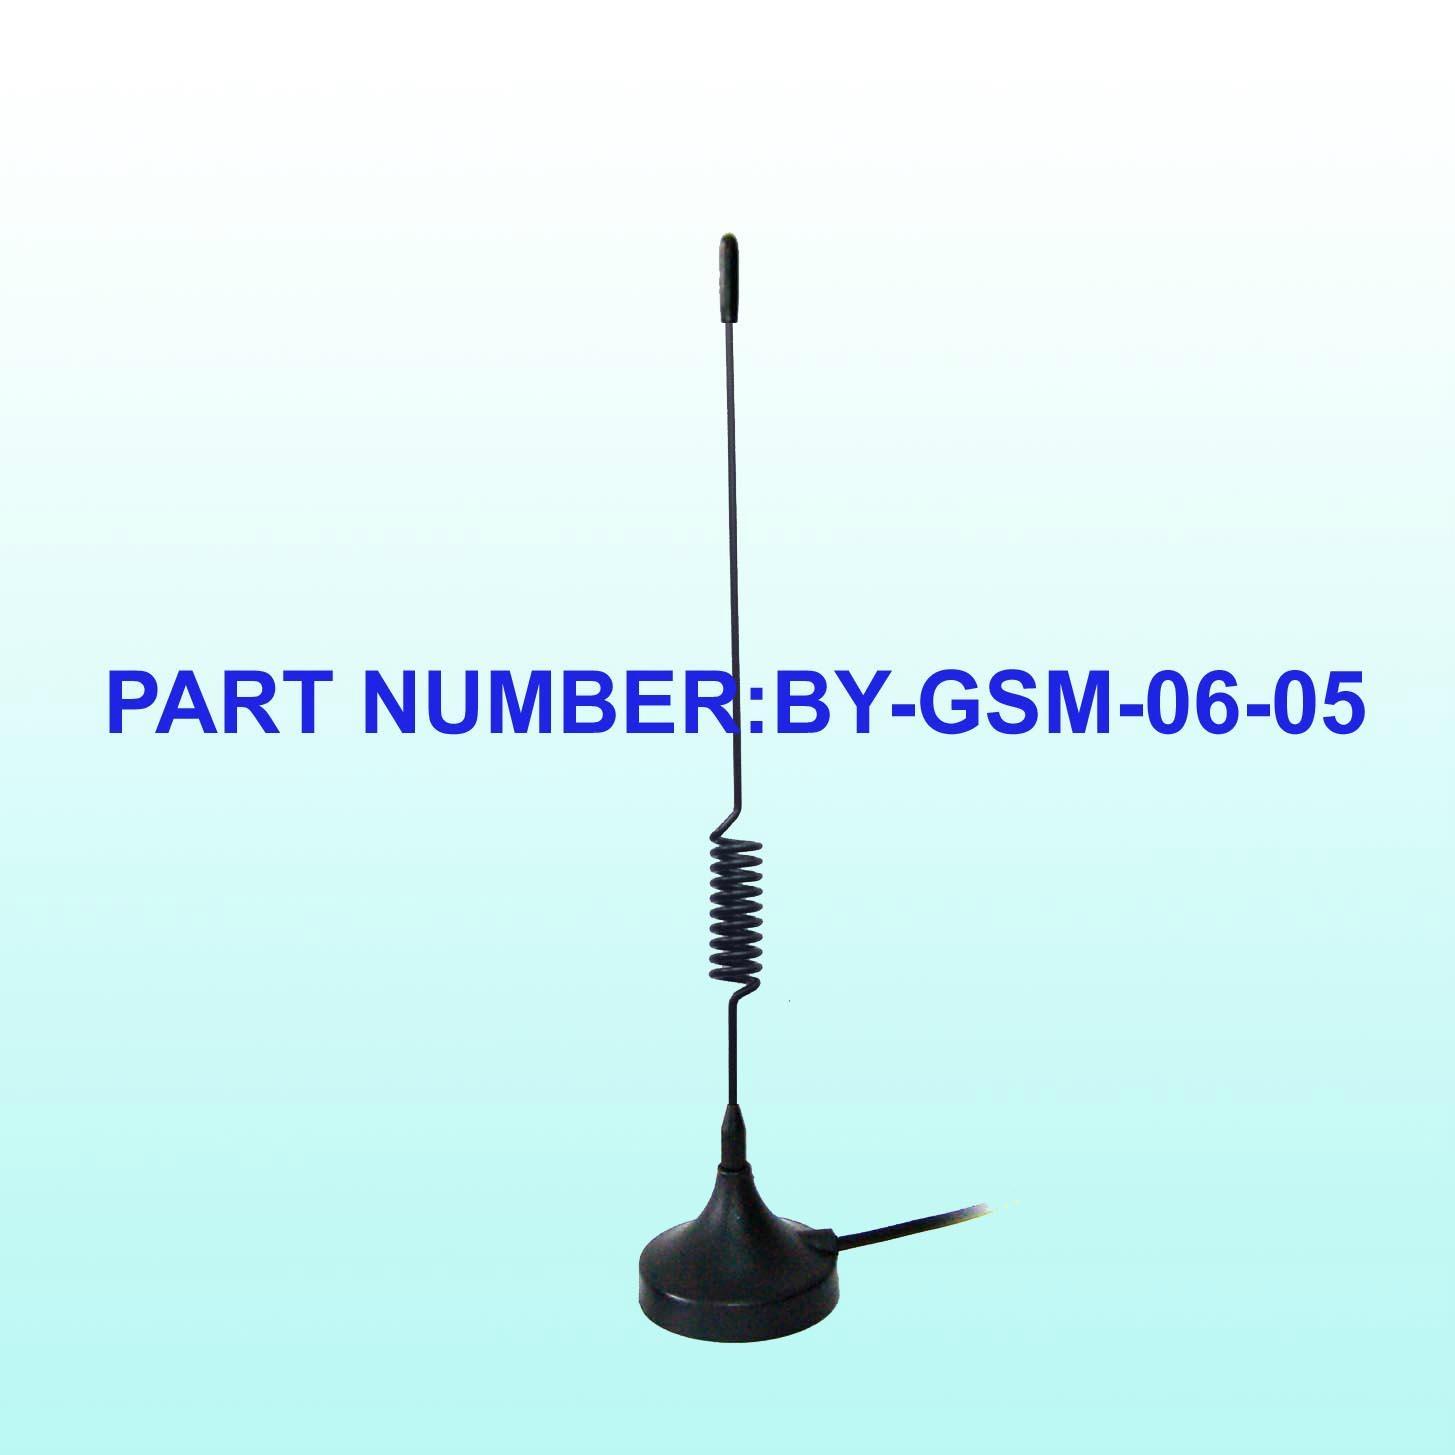 GSM Antenna Magnetic Car Antenna 900/1800MHz